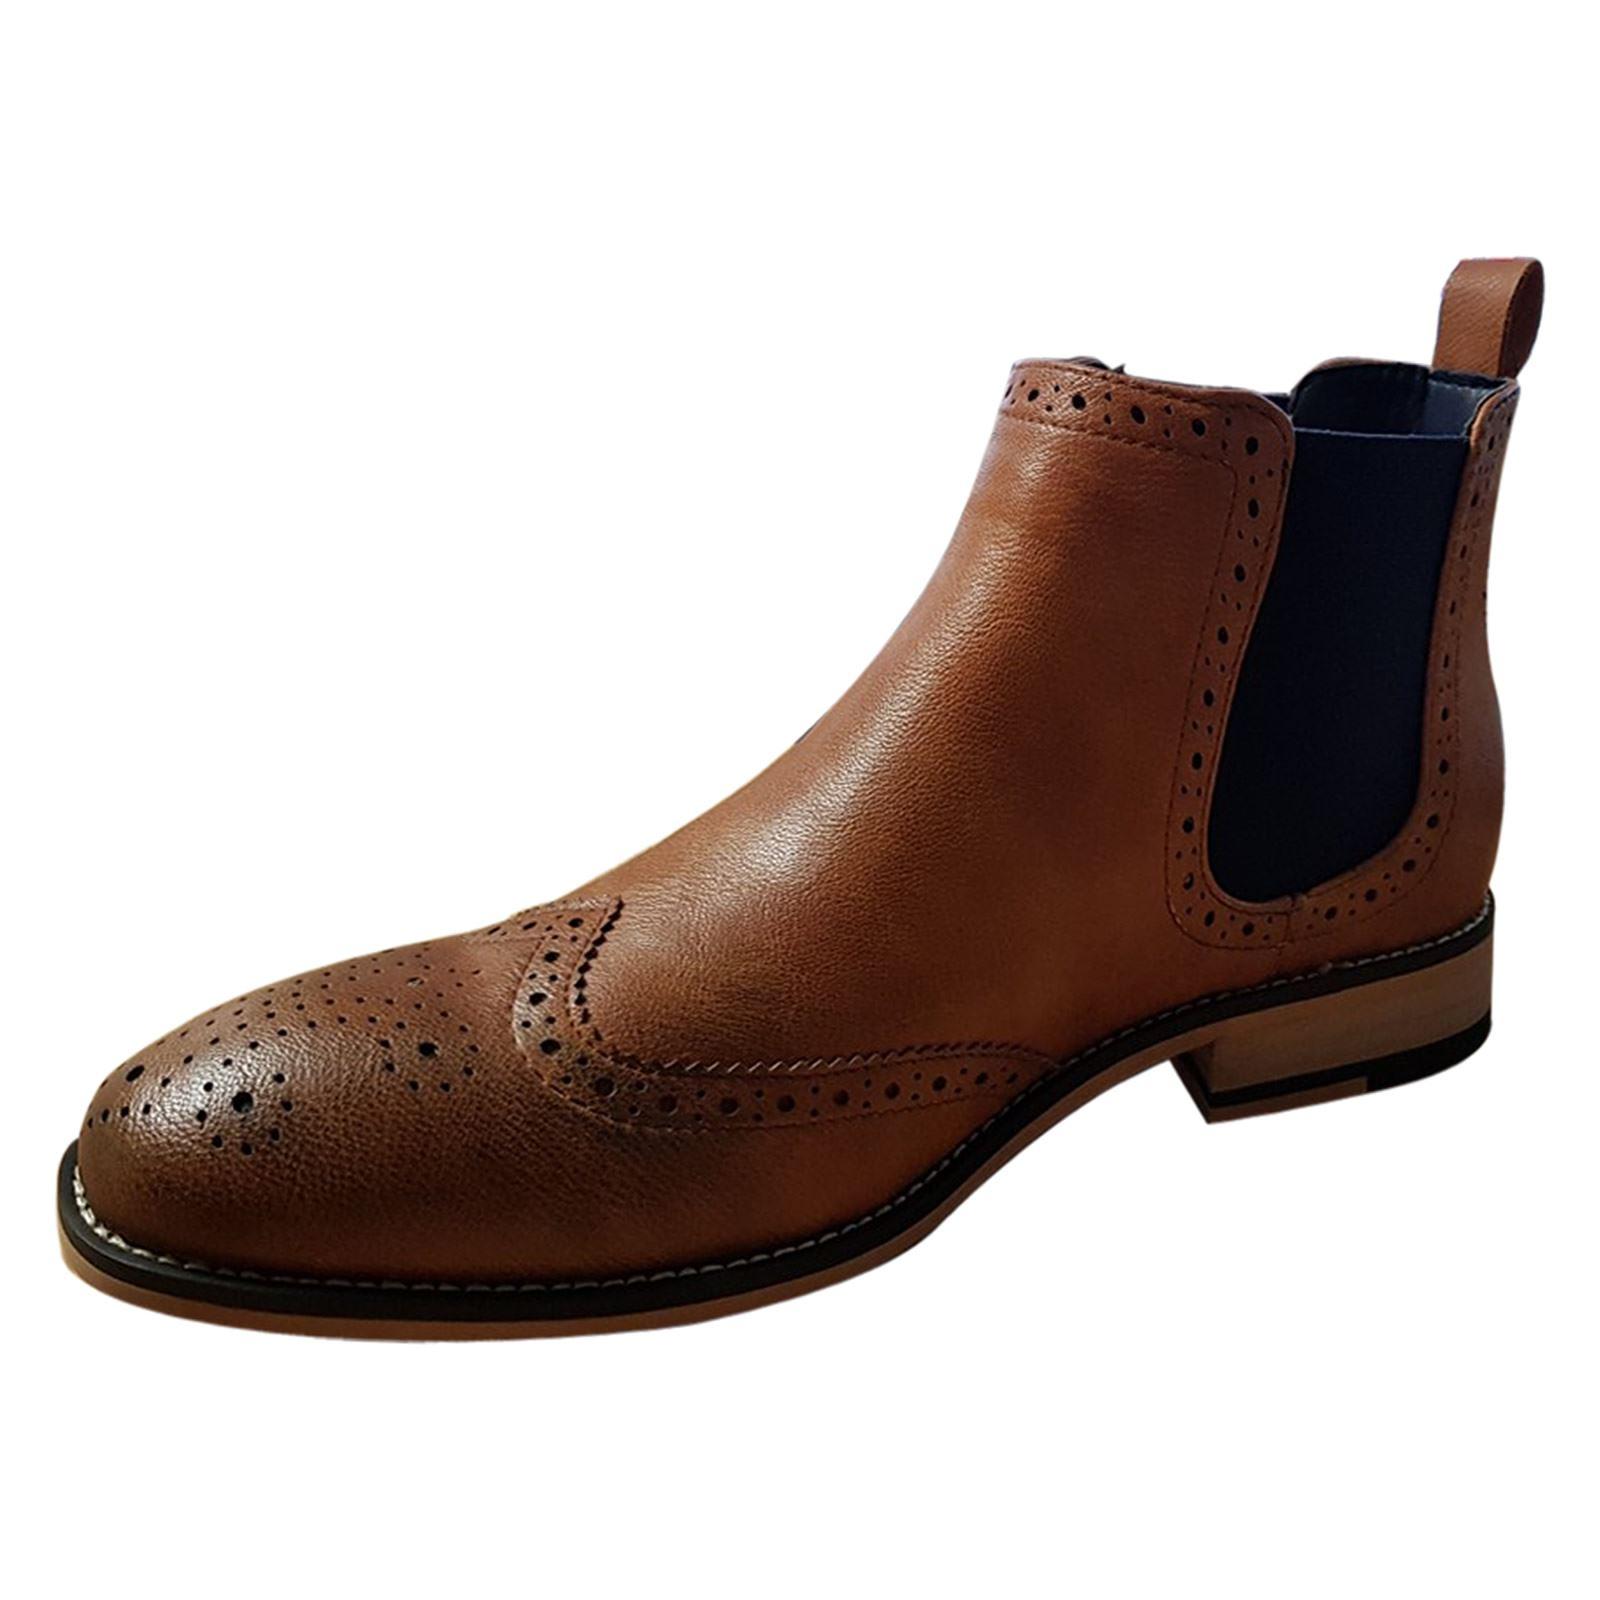 Mens Chelsea Boots Cavani Hound Leather Look Slip On Classic Mod ... 18f4f4b64ee